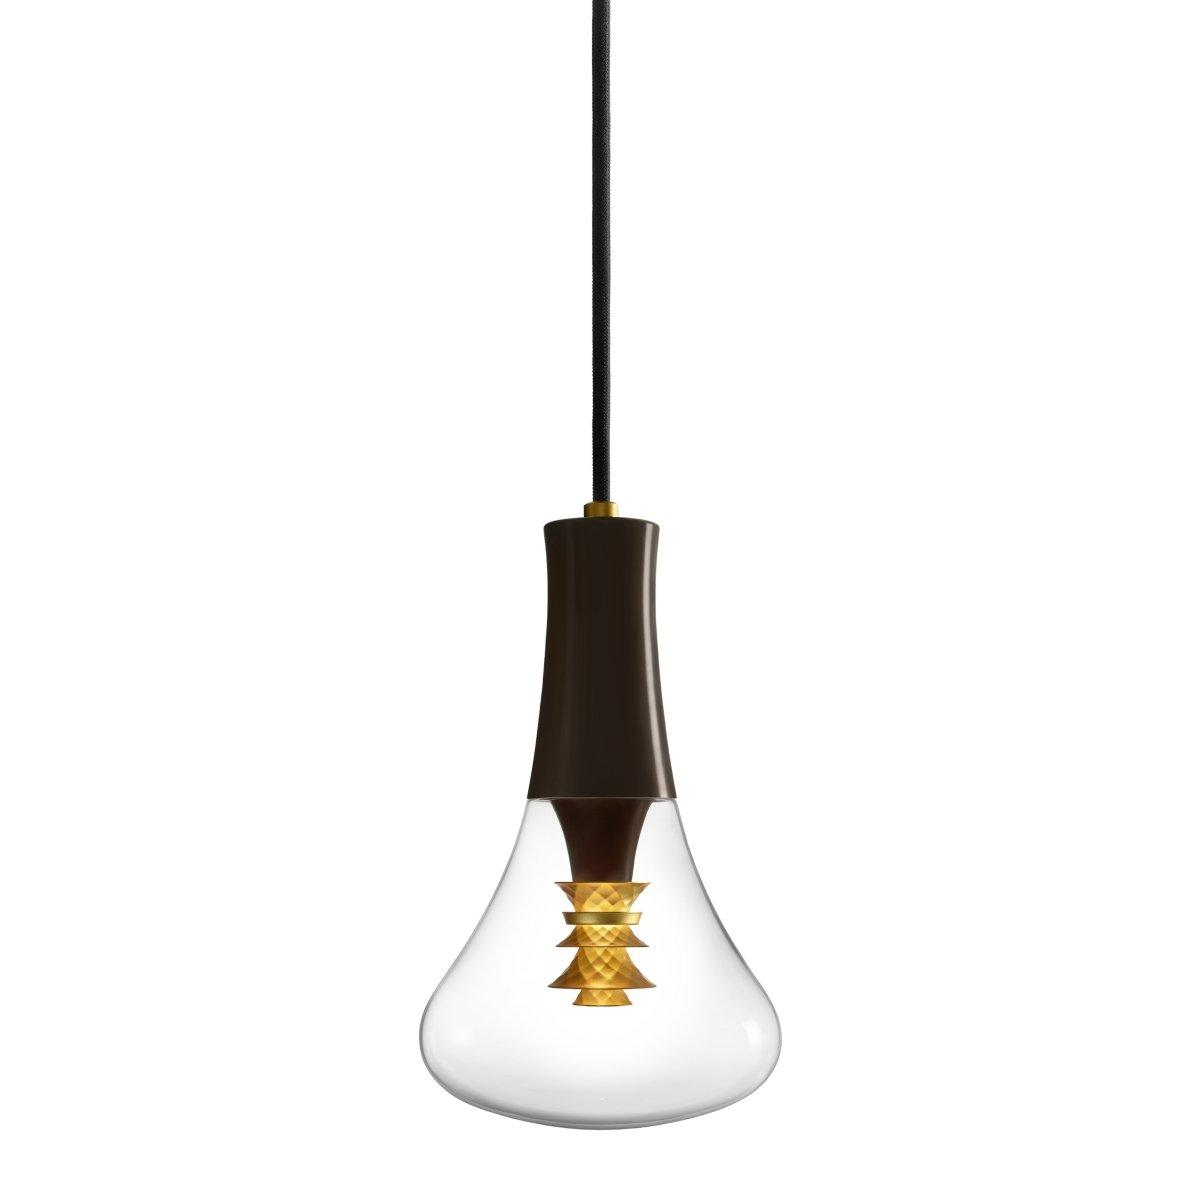 Дизайнерская лампа Plumen 003